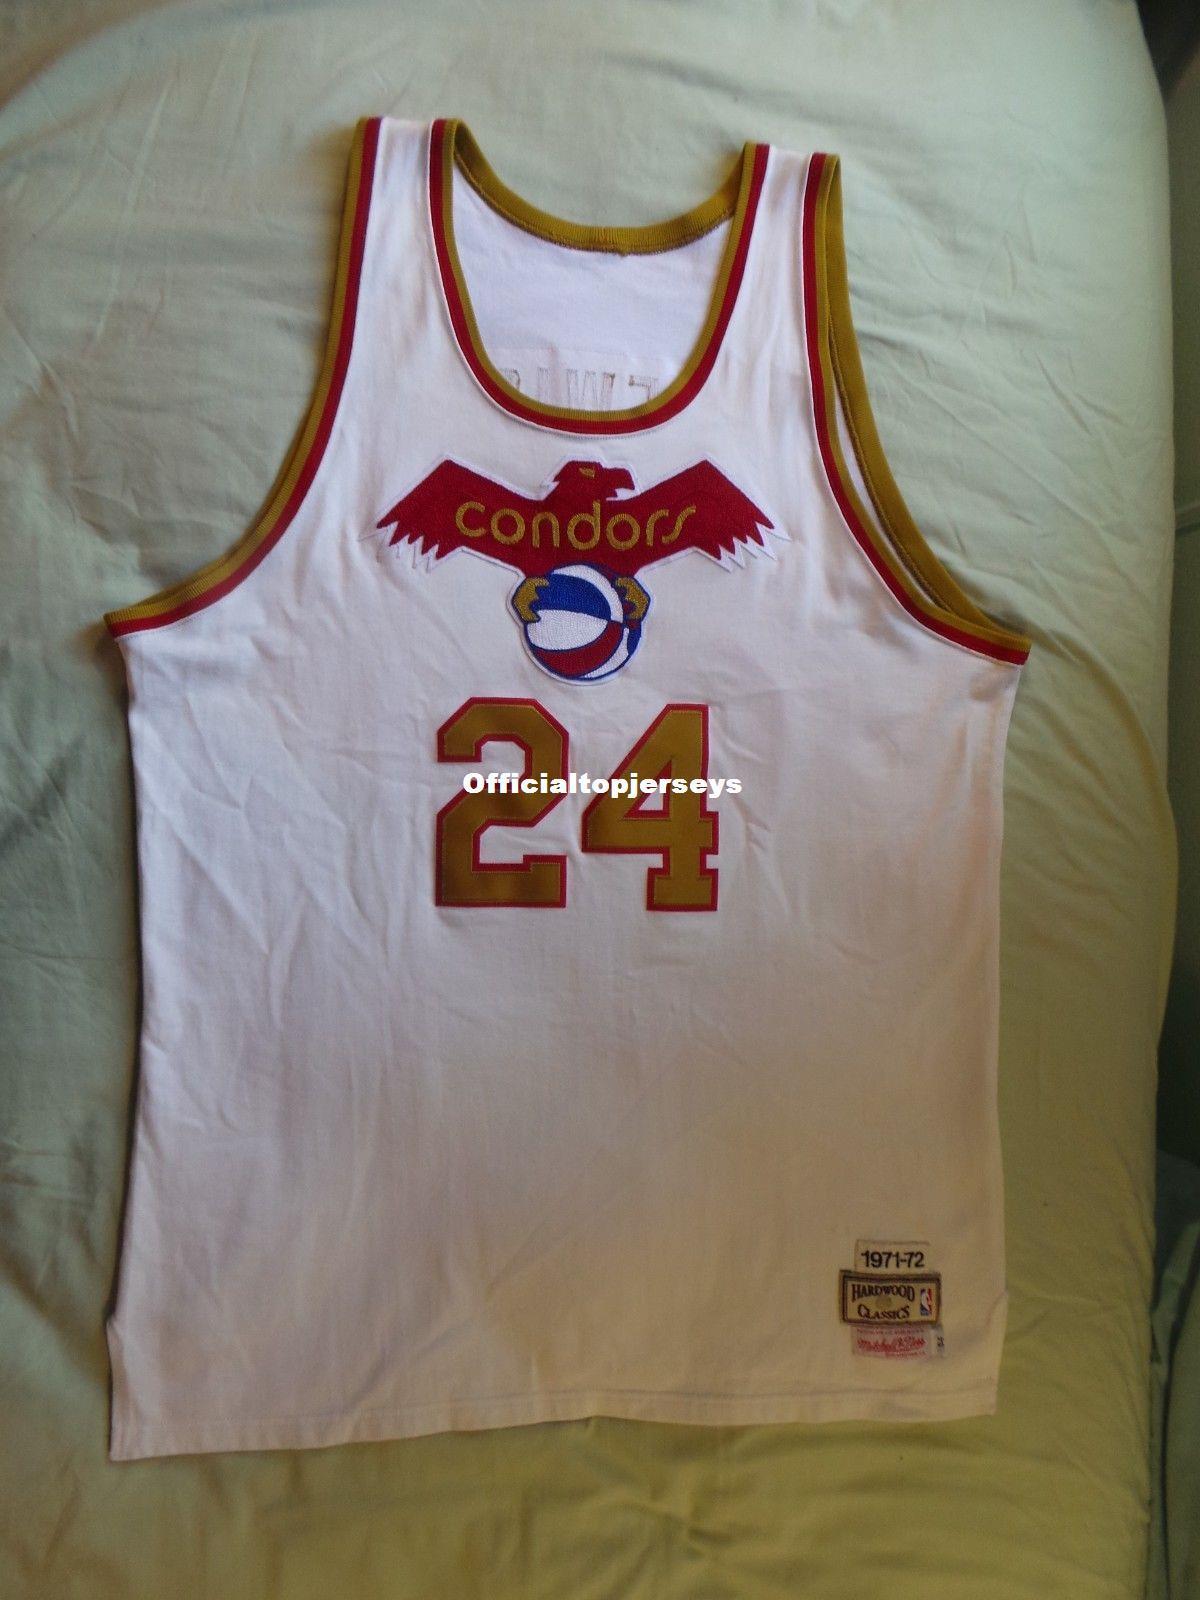 newest e0da9 ebd8d Cheap Mitchell Ness M&N Pittsburgh Condors ABA Jersey #24 Mike Lewis USA  Mens Vest Size XS-6XL Stitched basketball Jerseys Ncaa